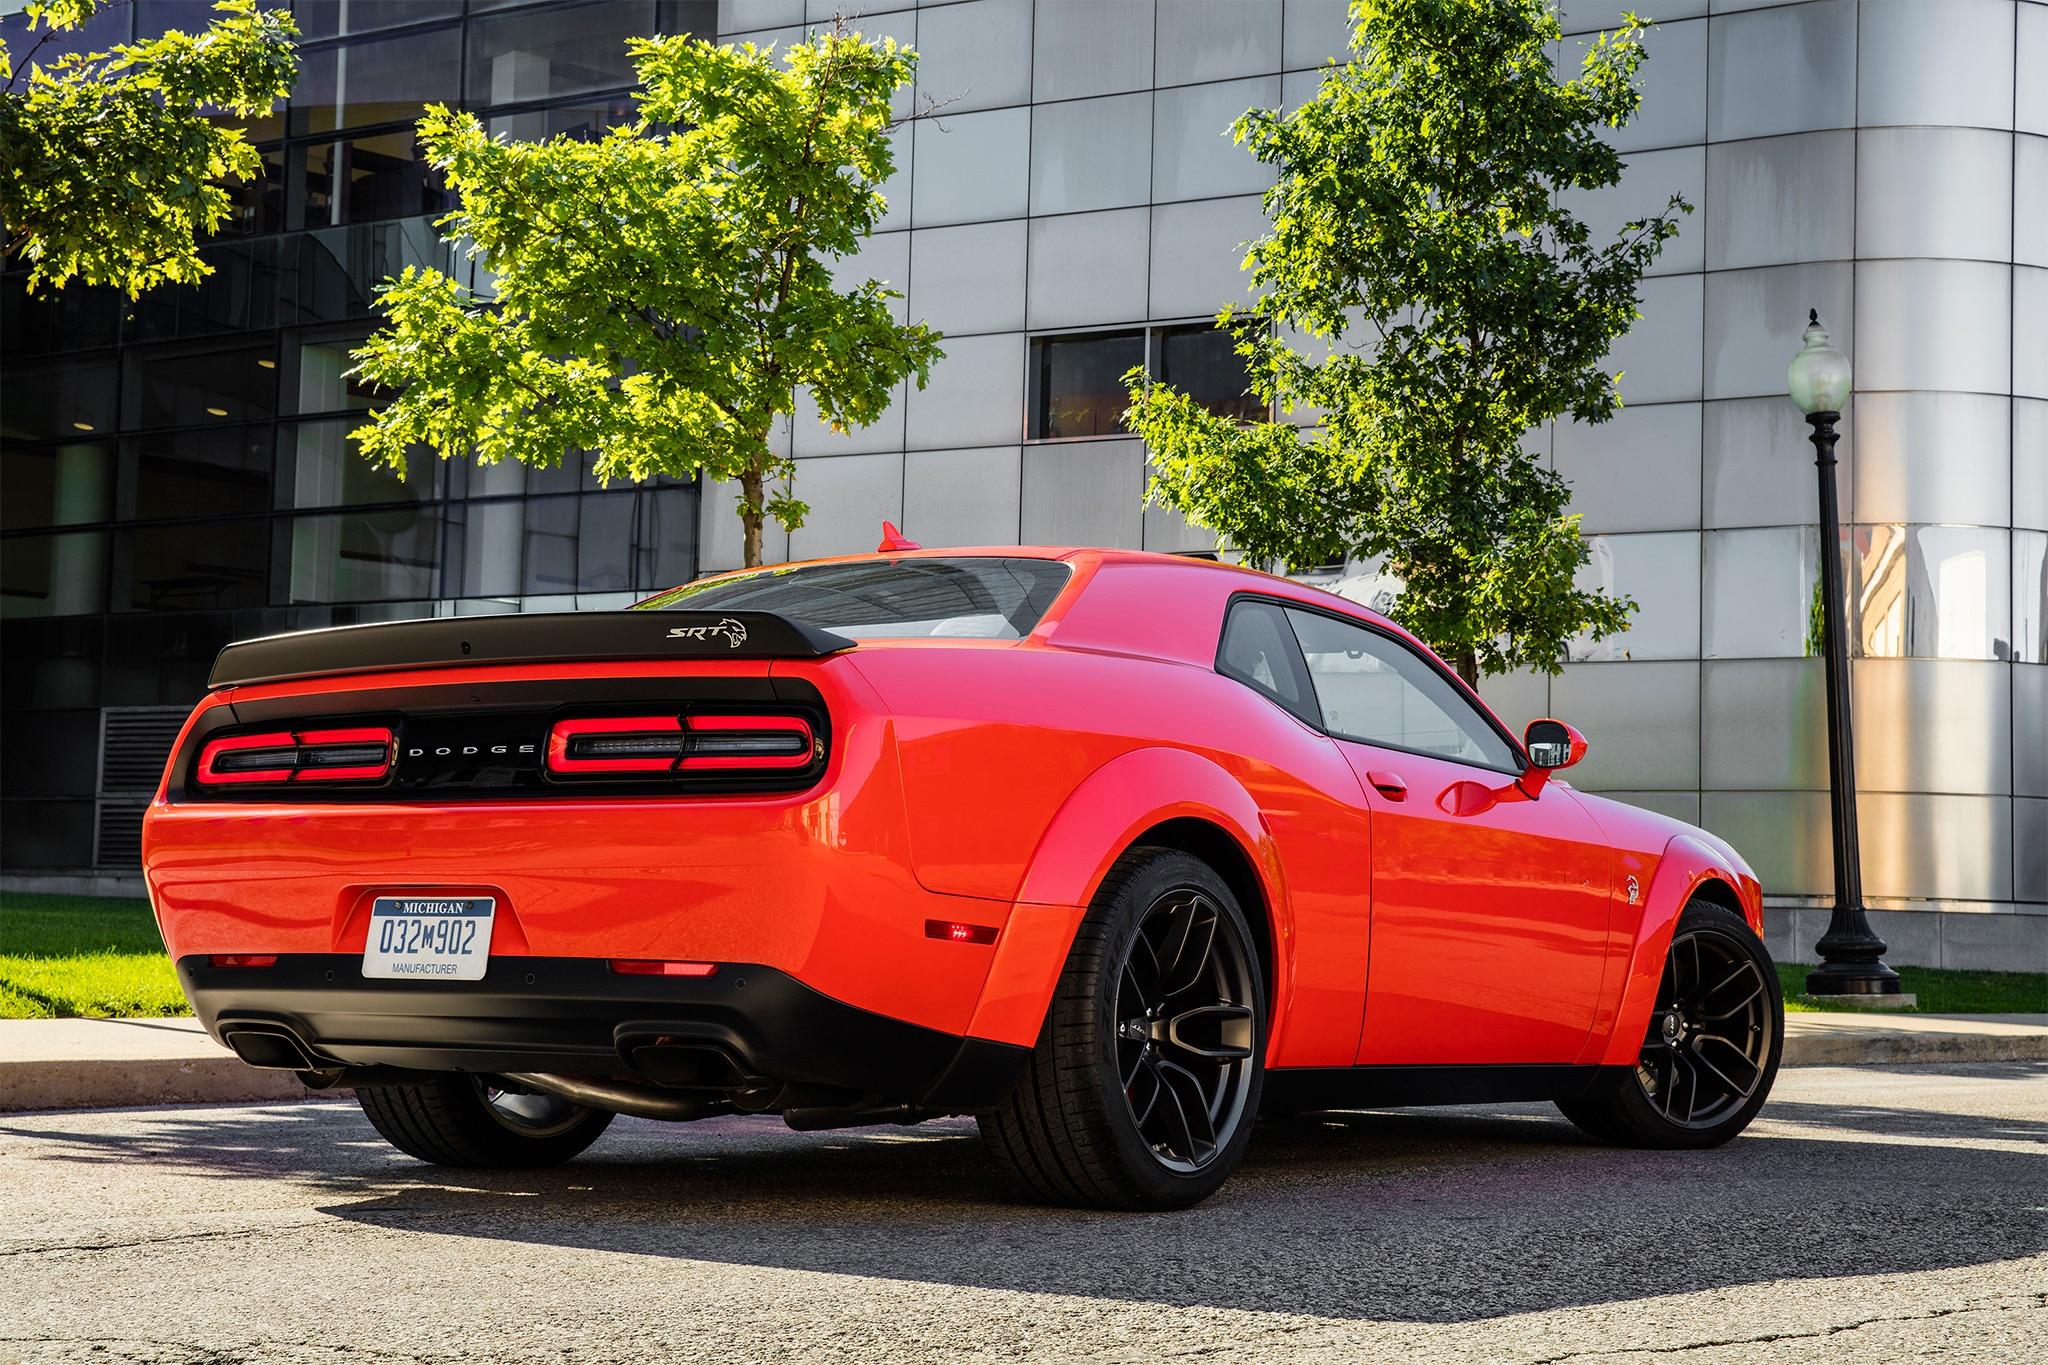 2018 Dodge Challenger Srt Hellcat Widebody Track Drive Review